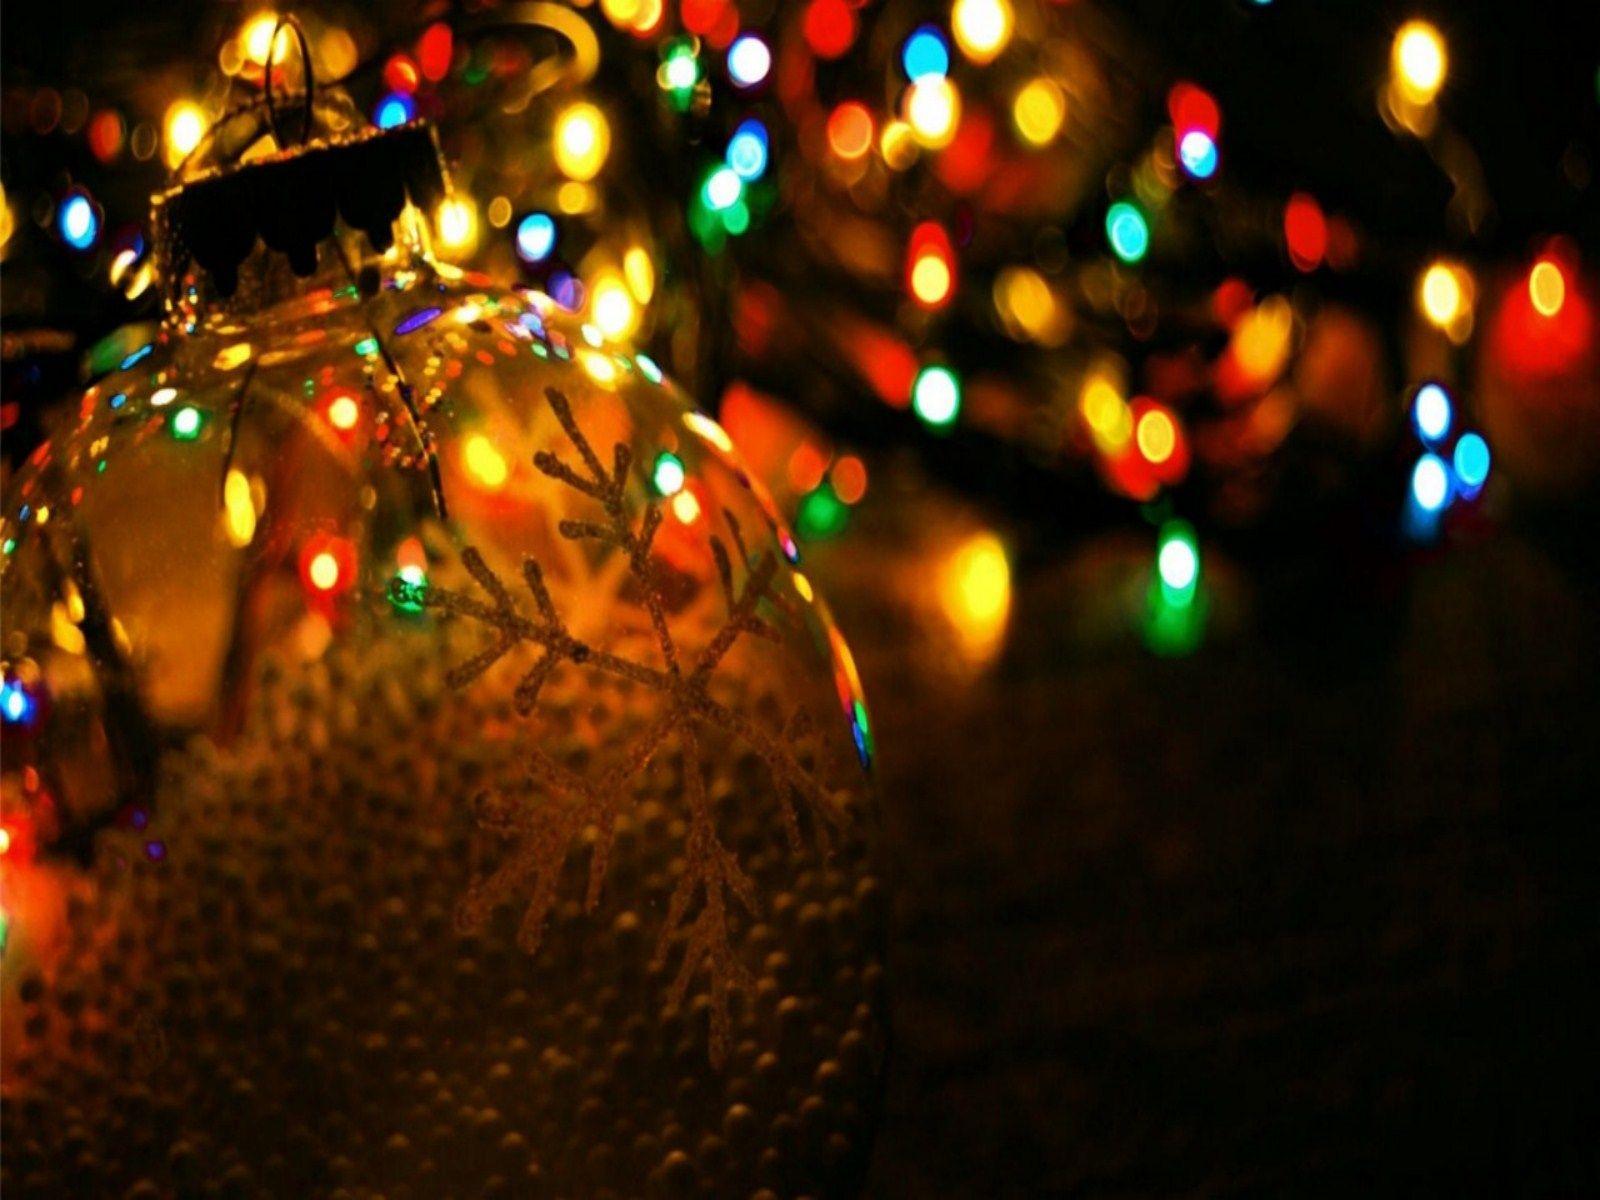 Stunningly Beautiful Christmas Desktop Wallpapers Website